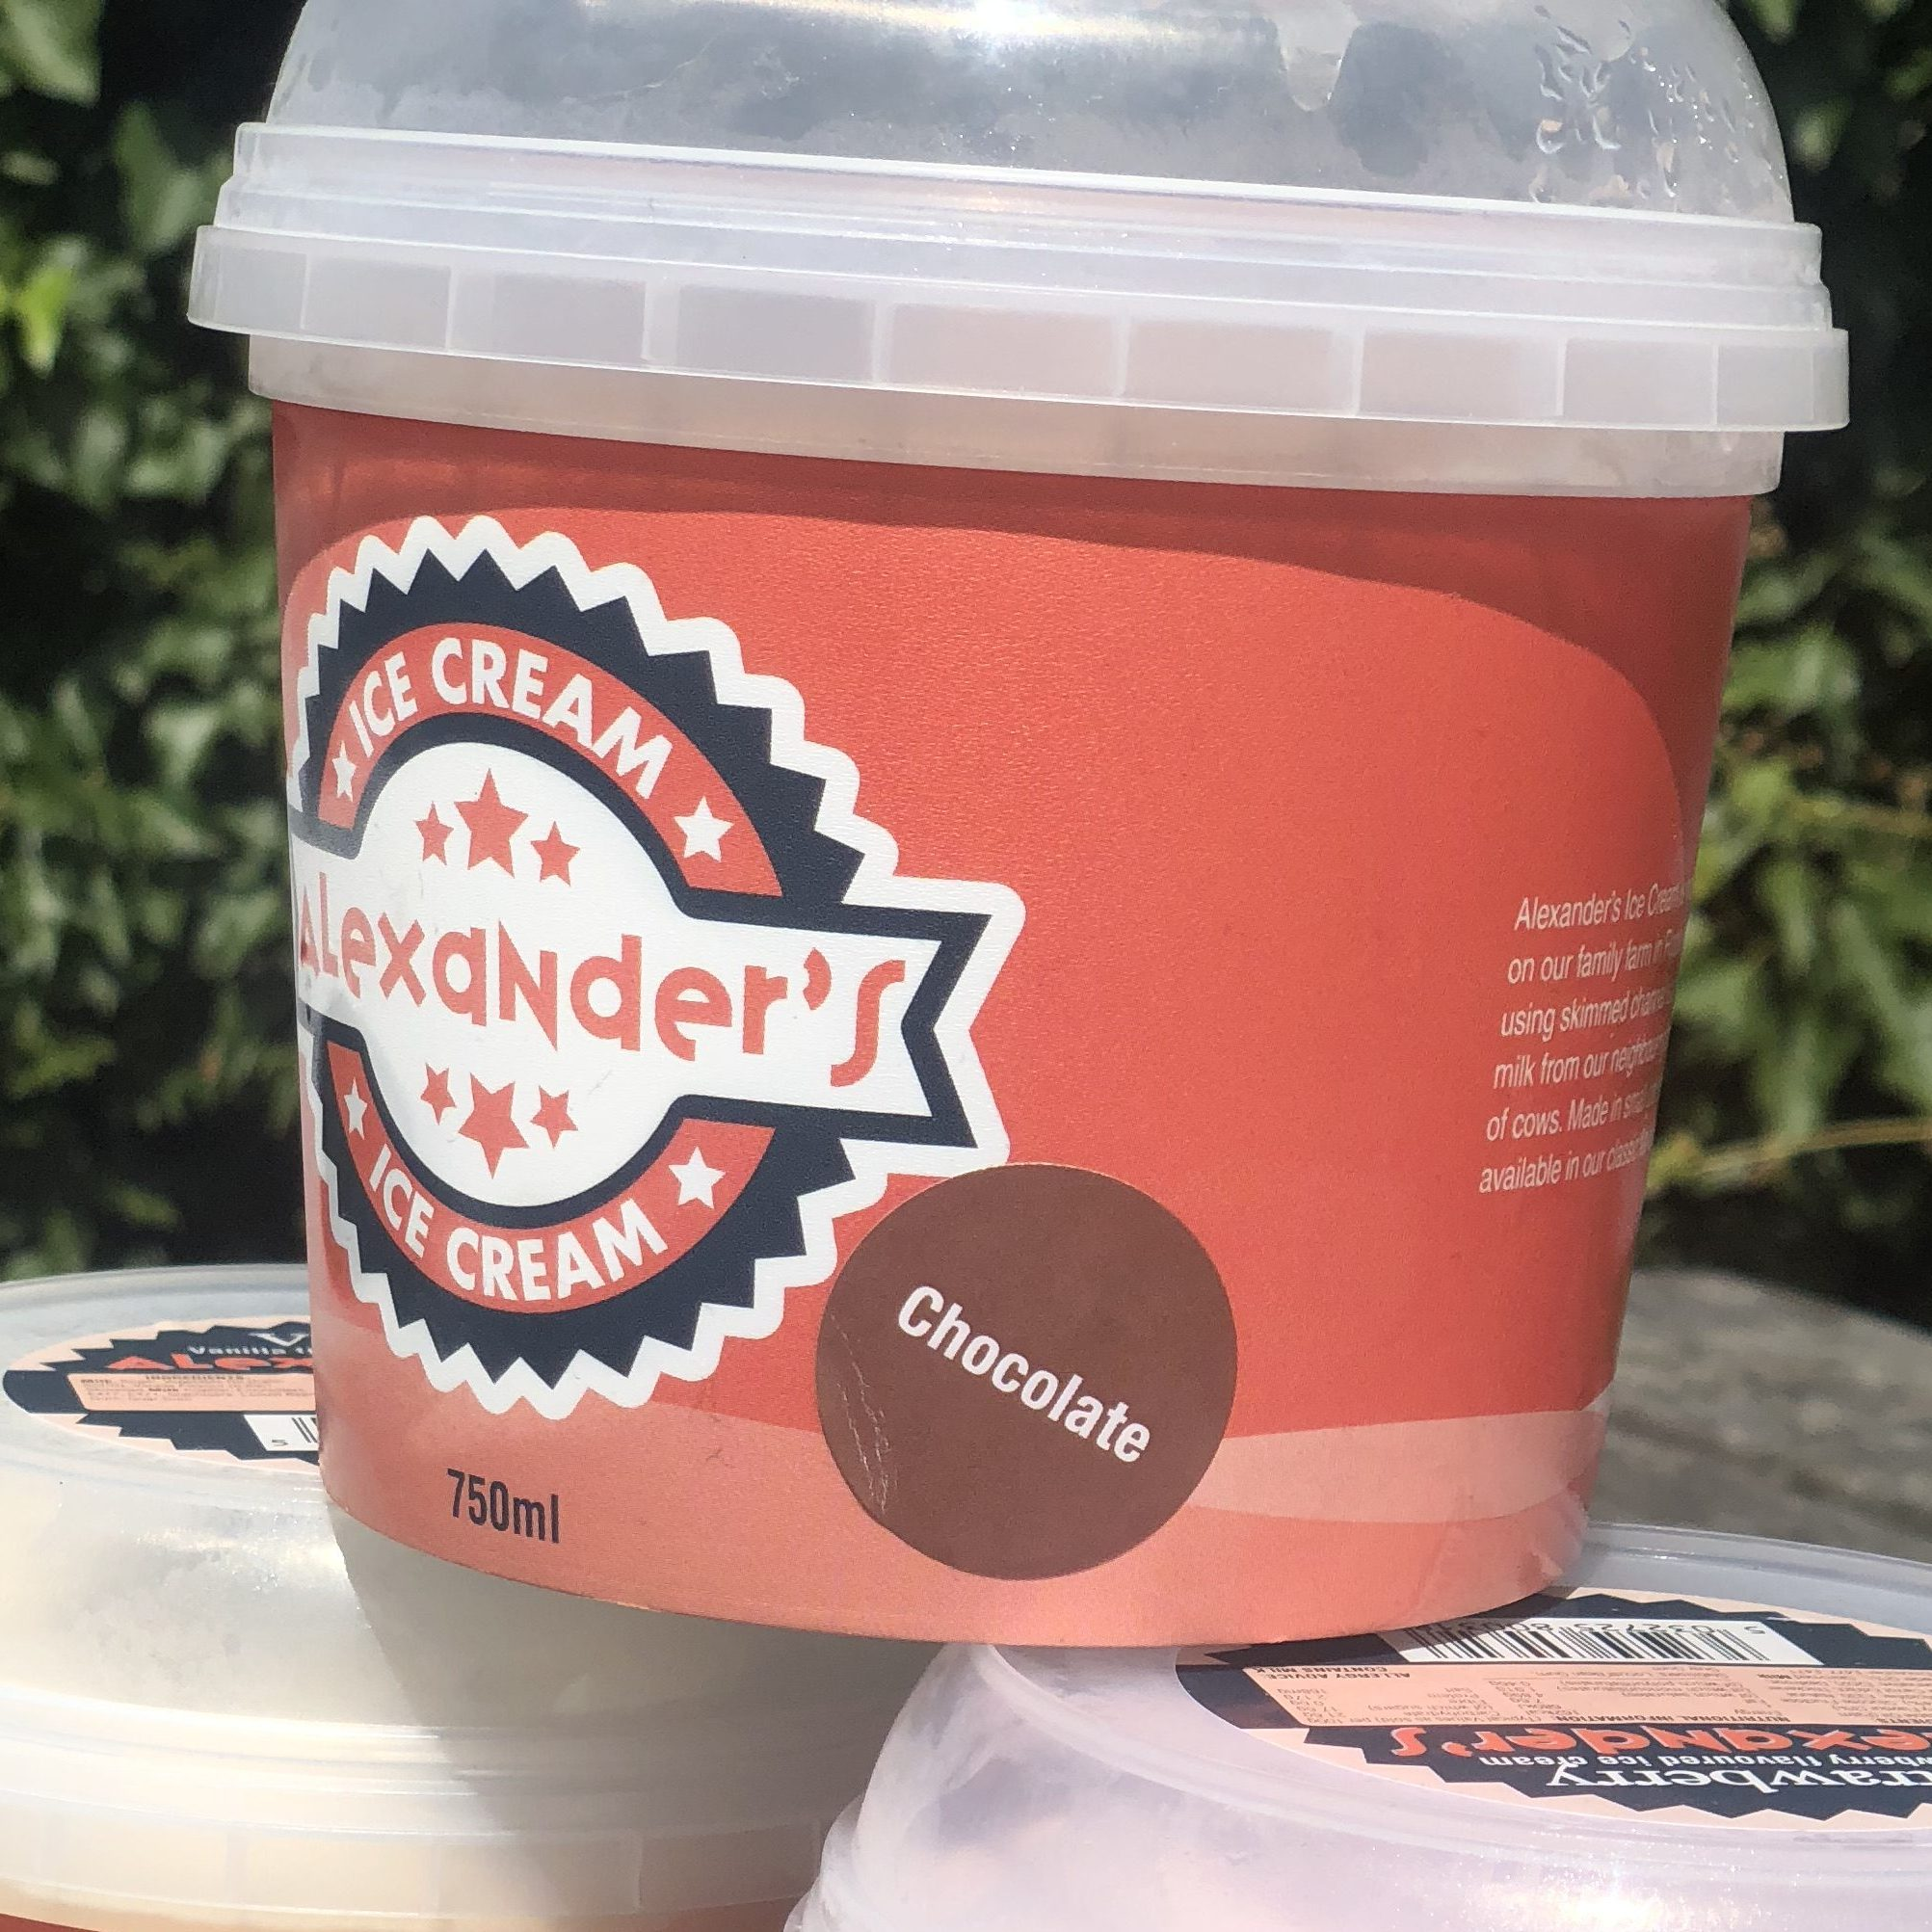 Alexander's Lower Fat Chocolate Ice Cream 🍫